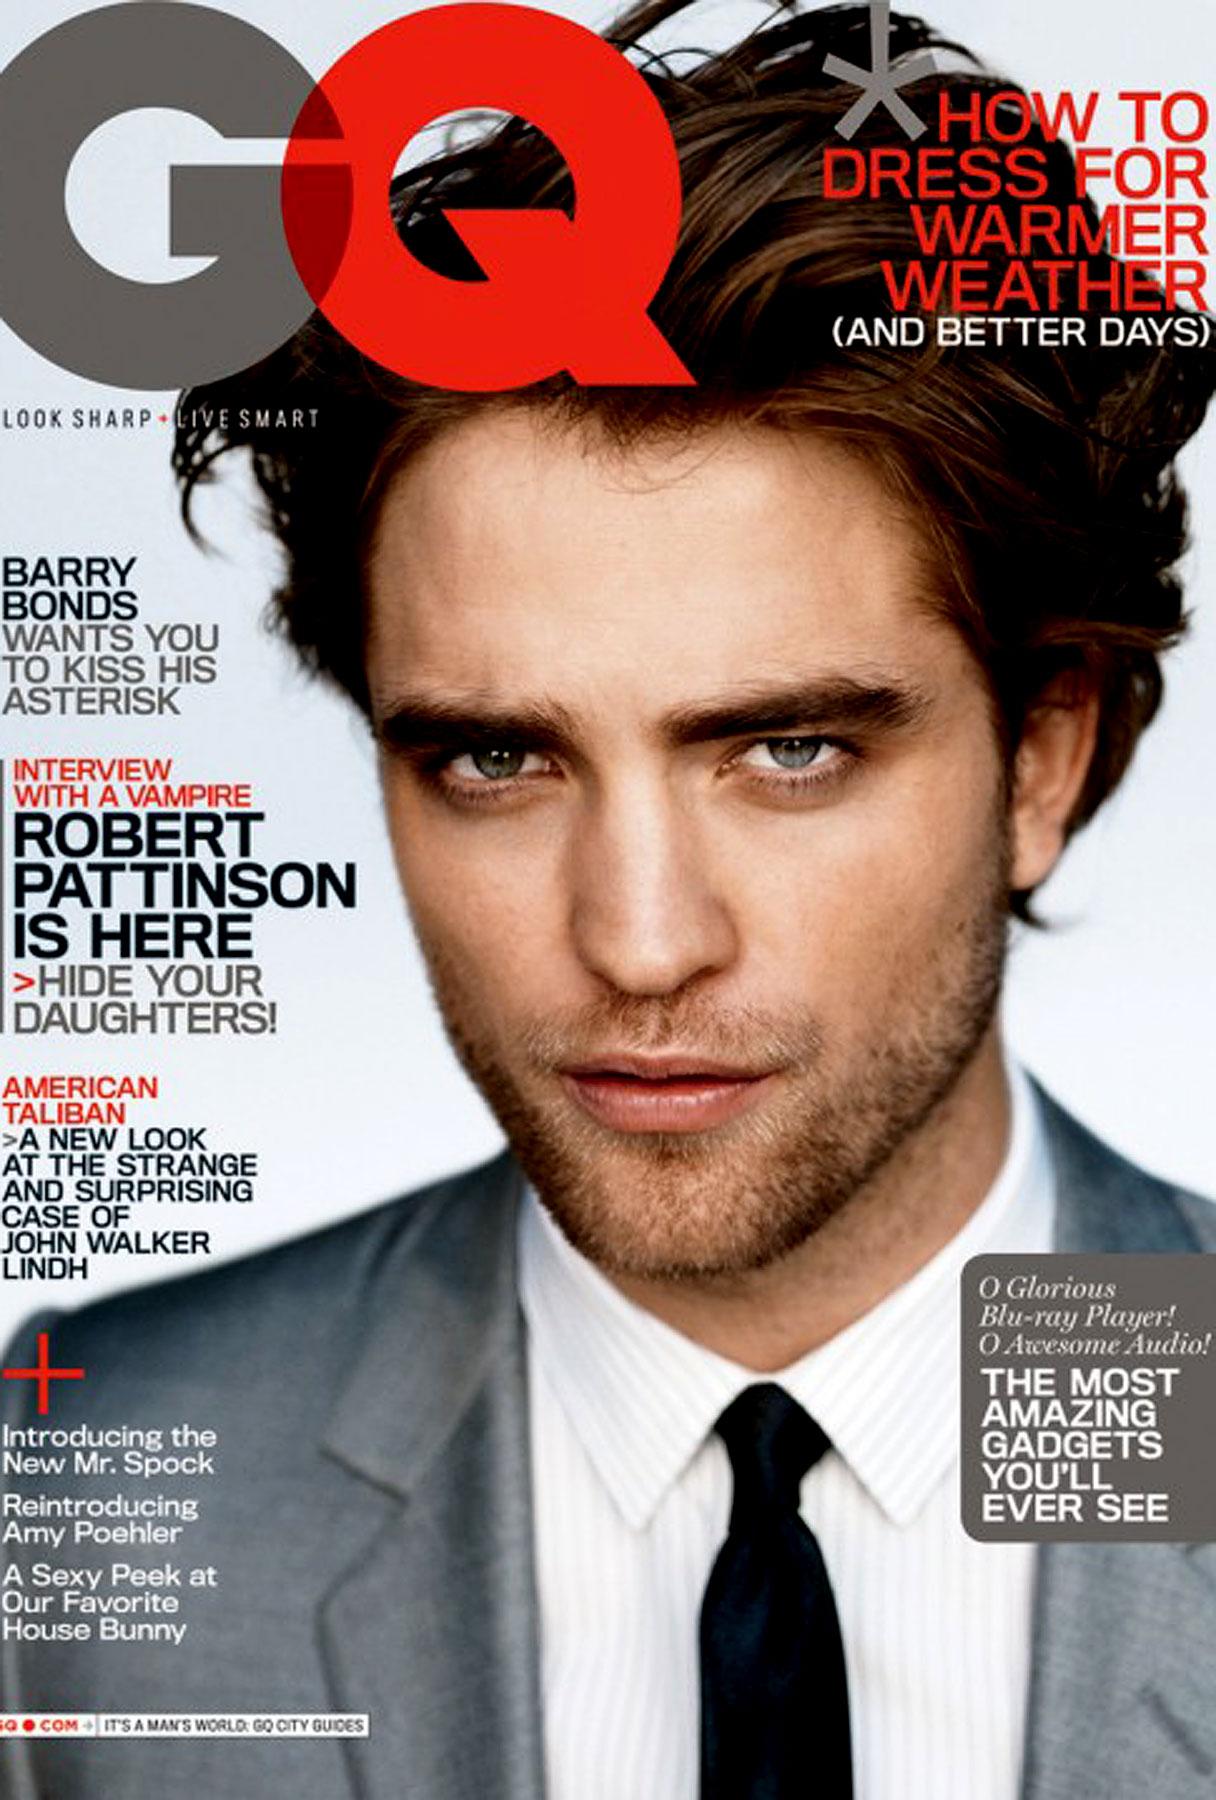 Robert Pattinson Has 'GQ' Covered